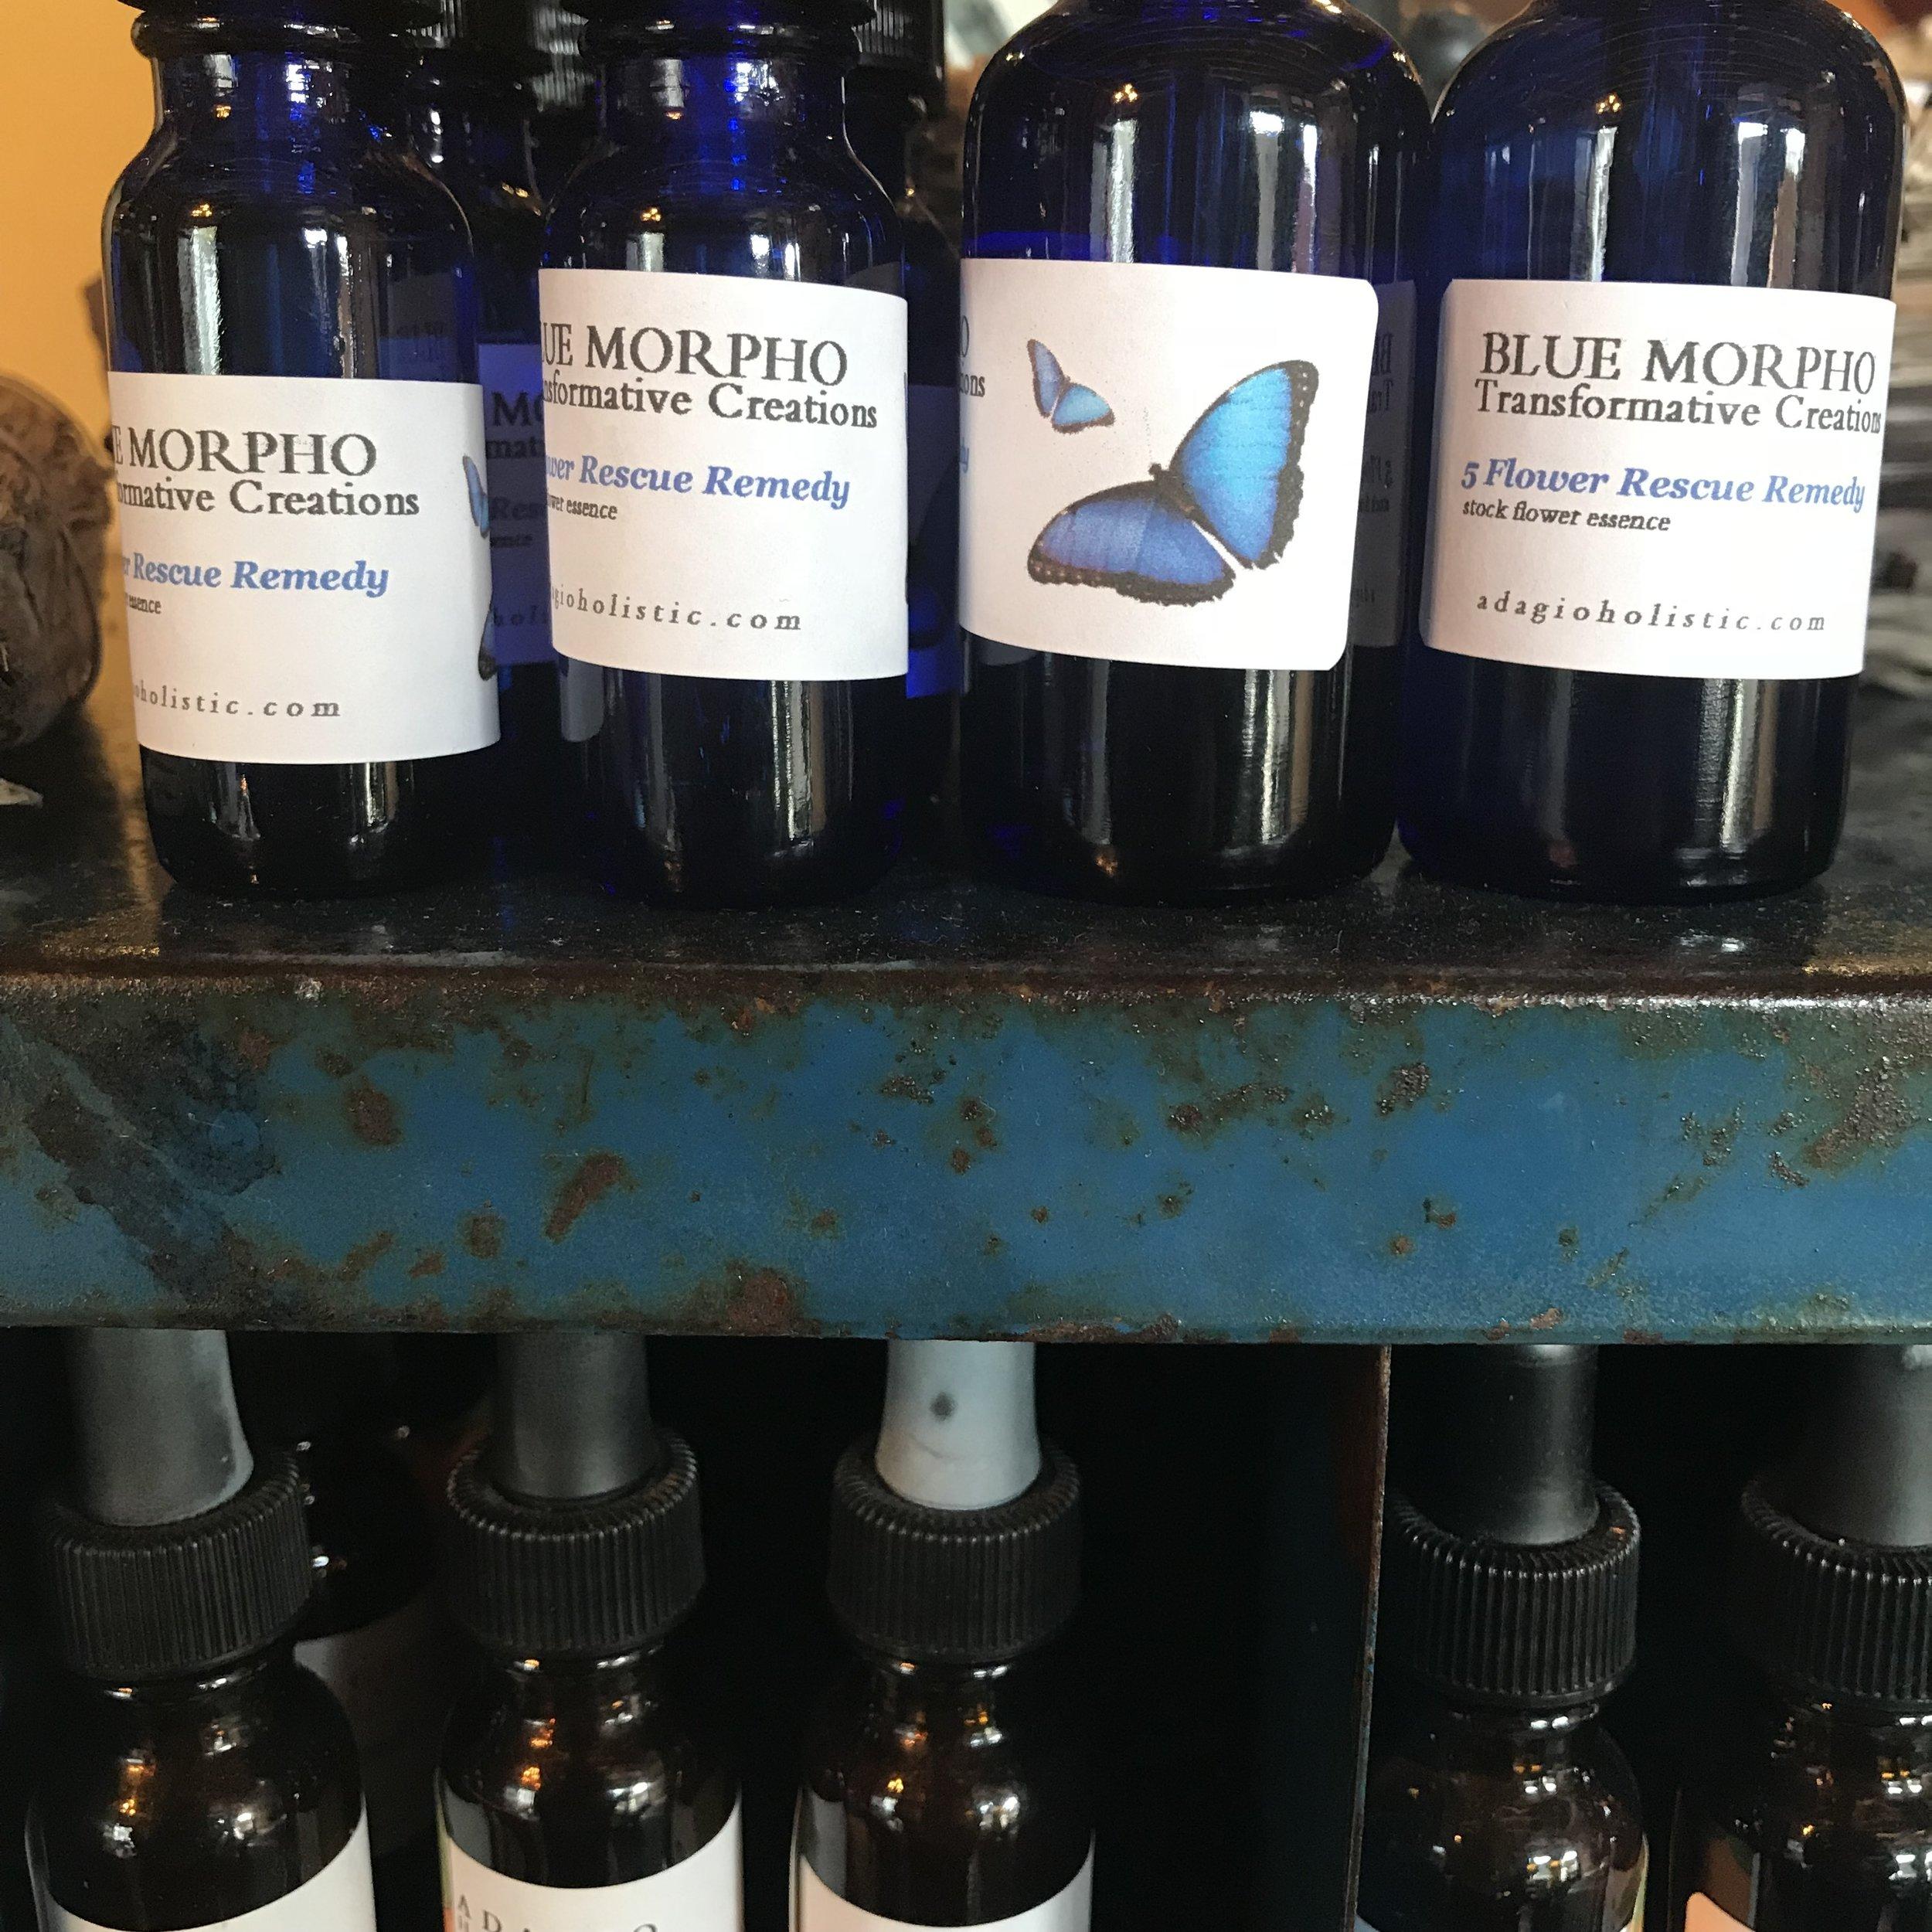 adagio+holistic+therapies+flower+essence+pharmacy+minneapolis.jpg